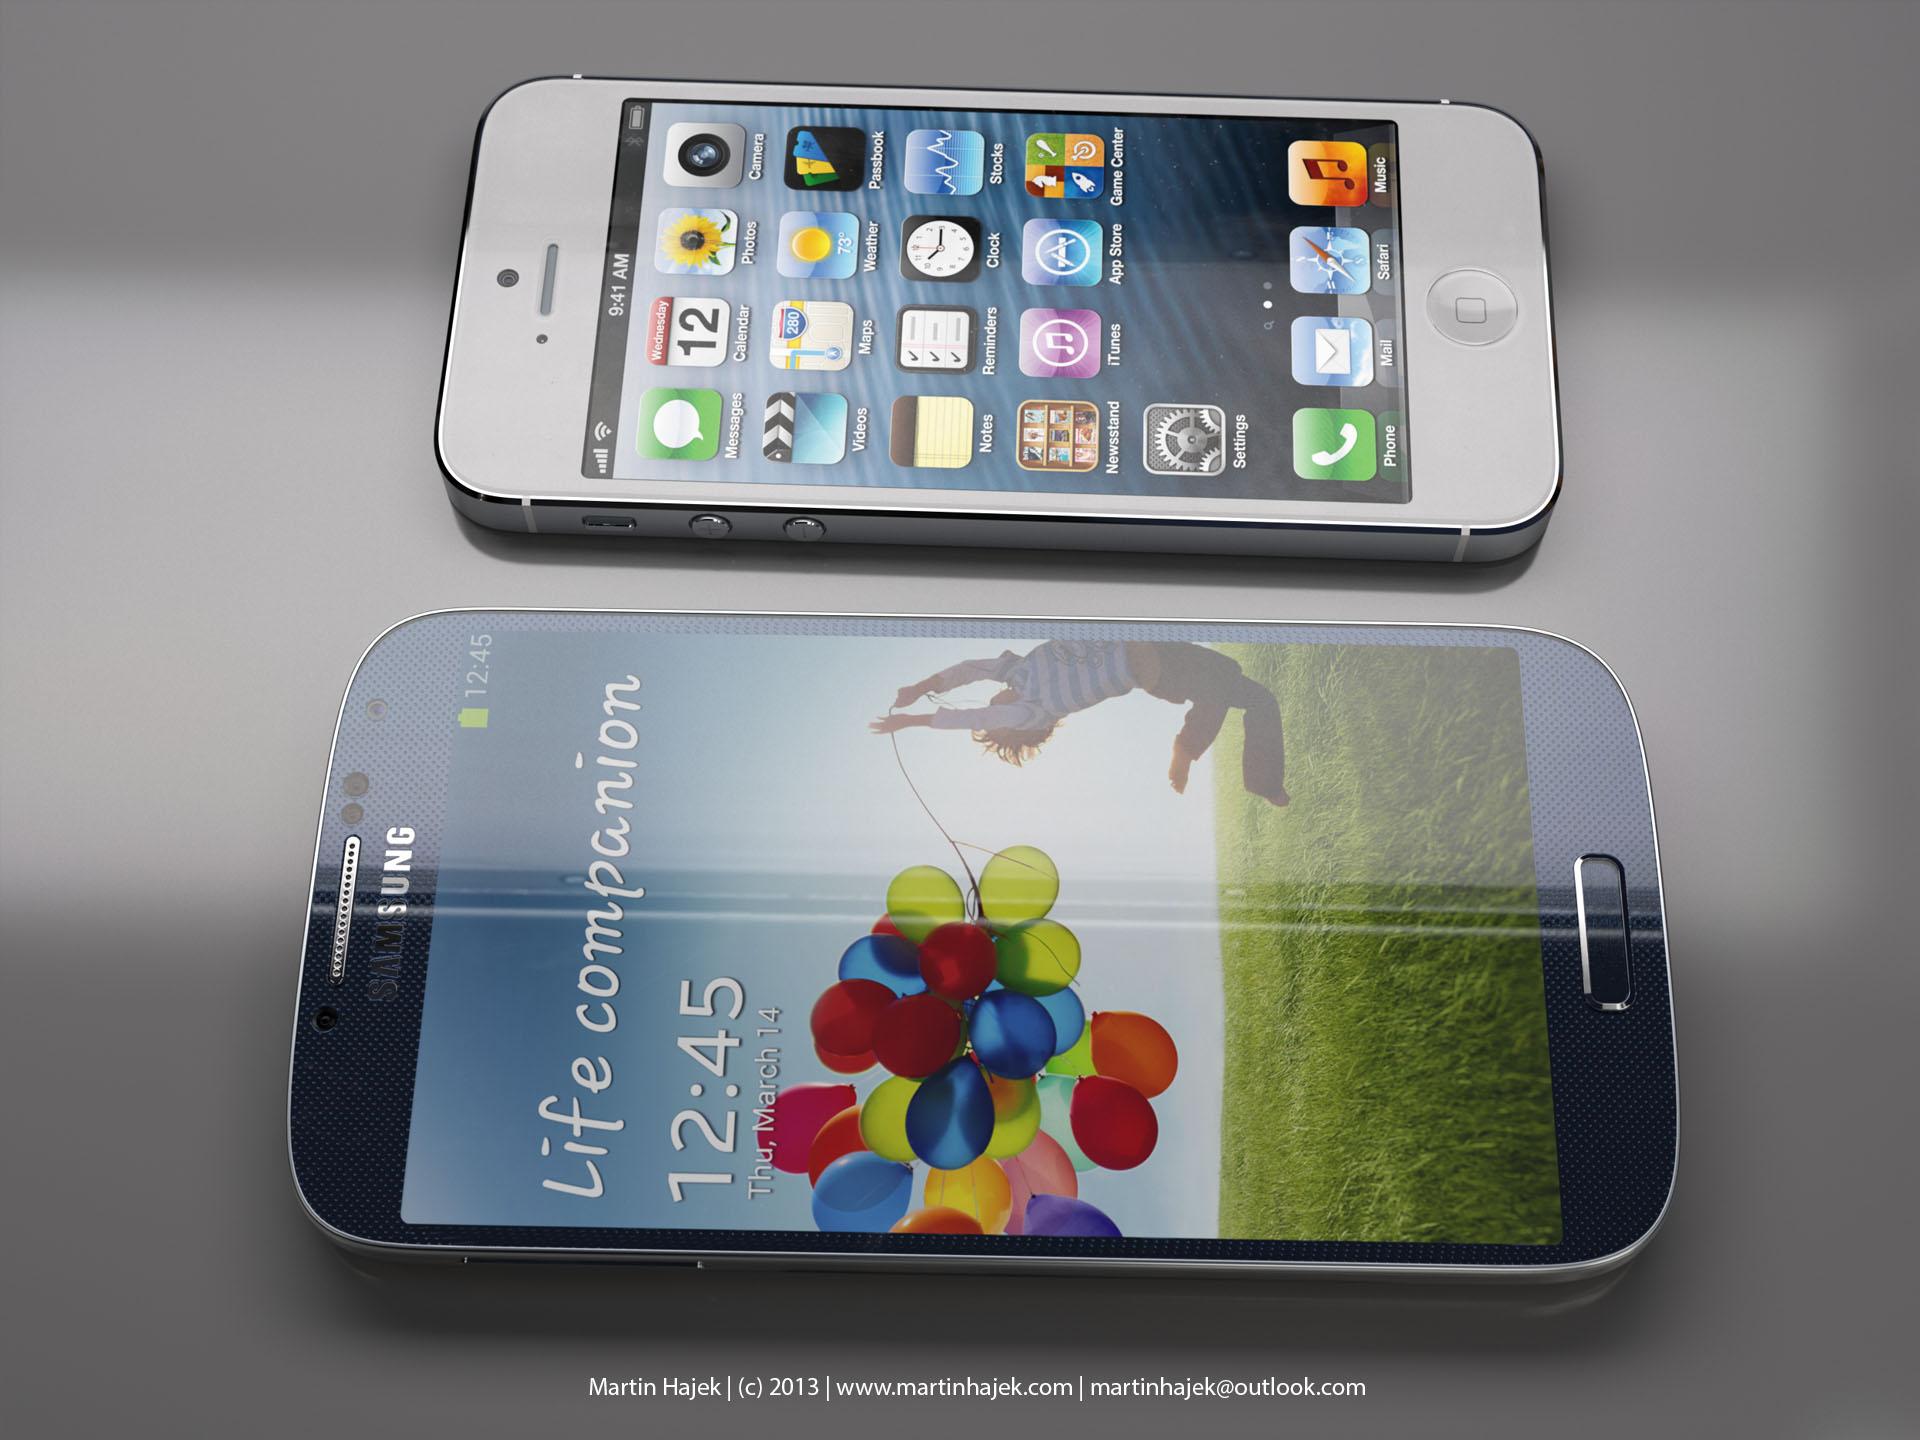 Size comparison (Galaxy S4 vs iPhone 5, Martin Hajek 004)